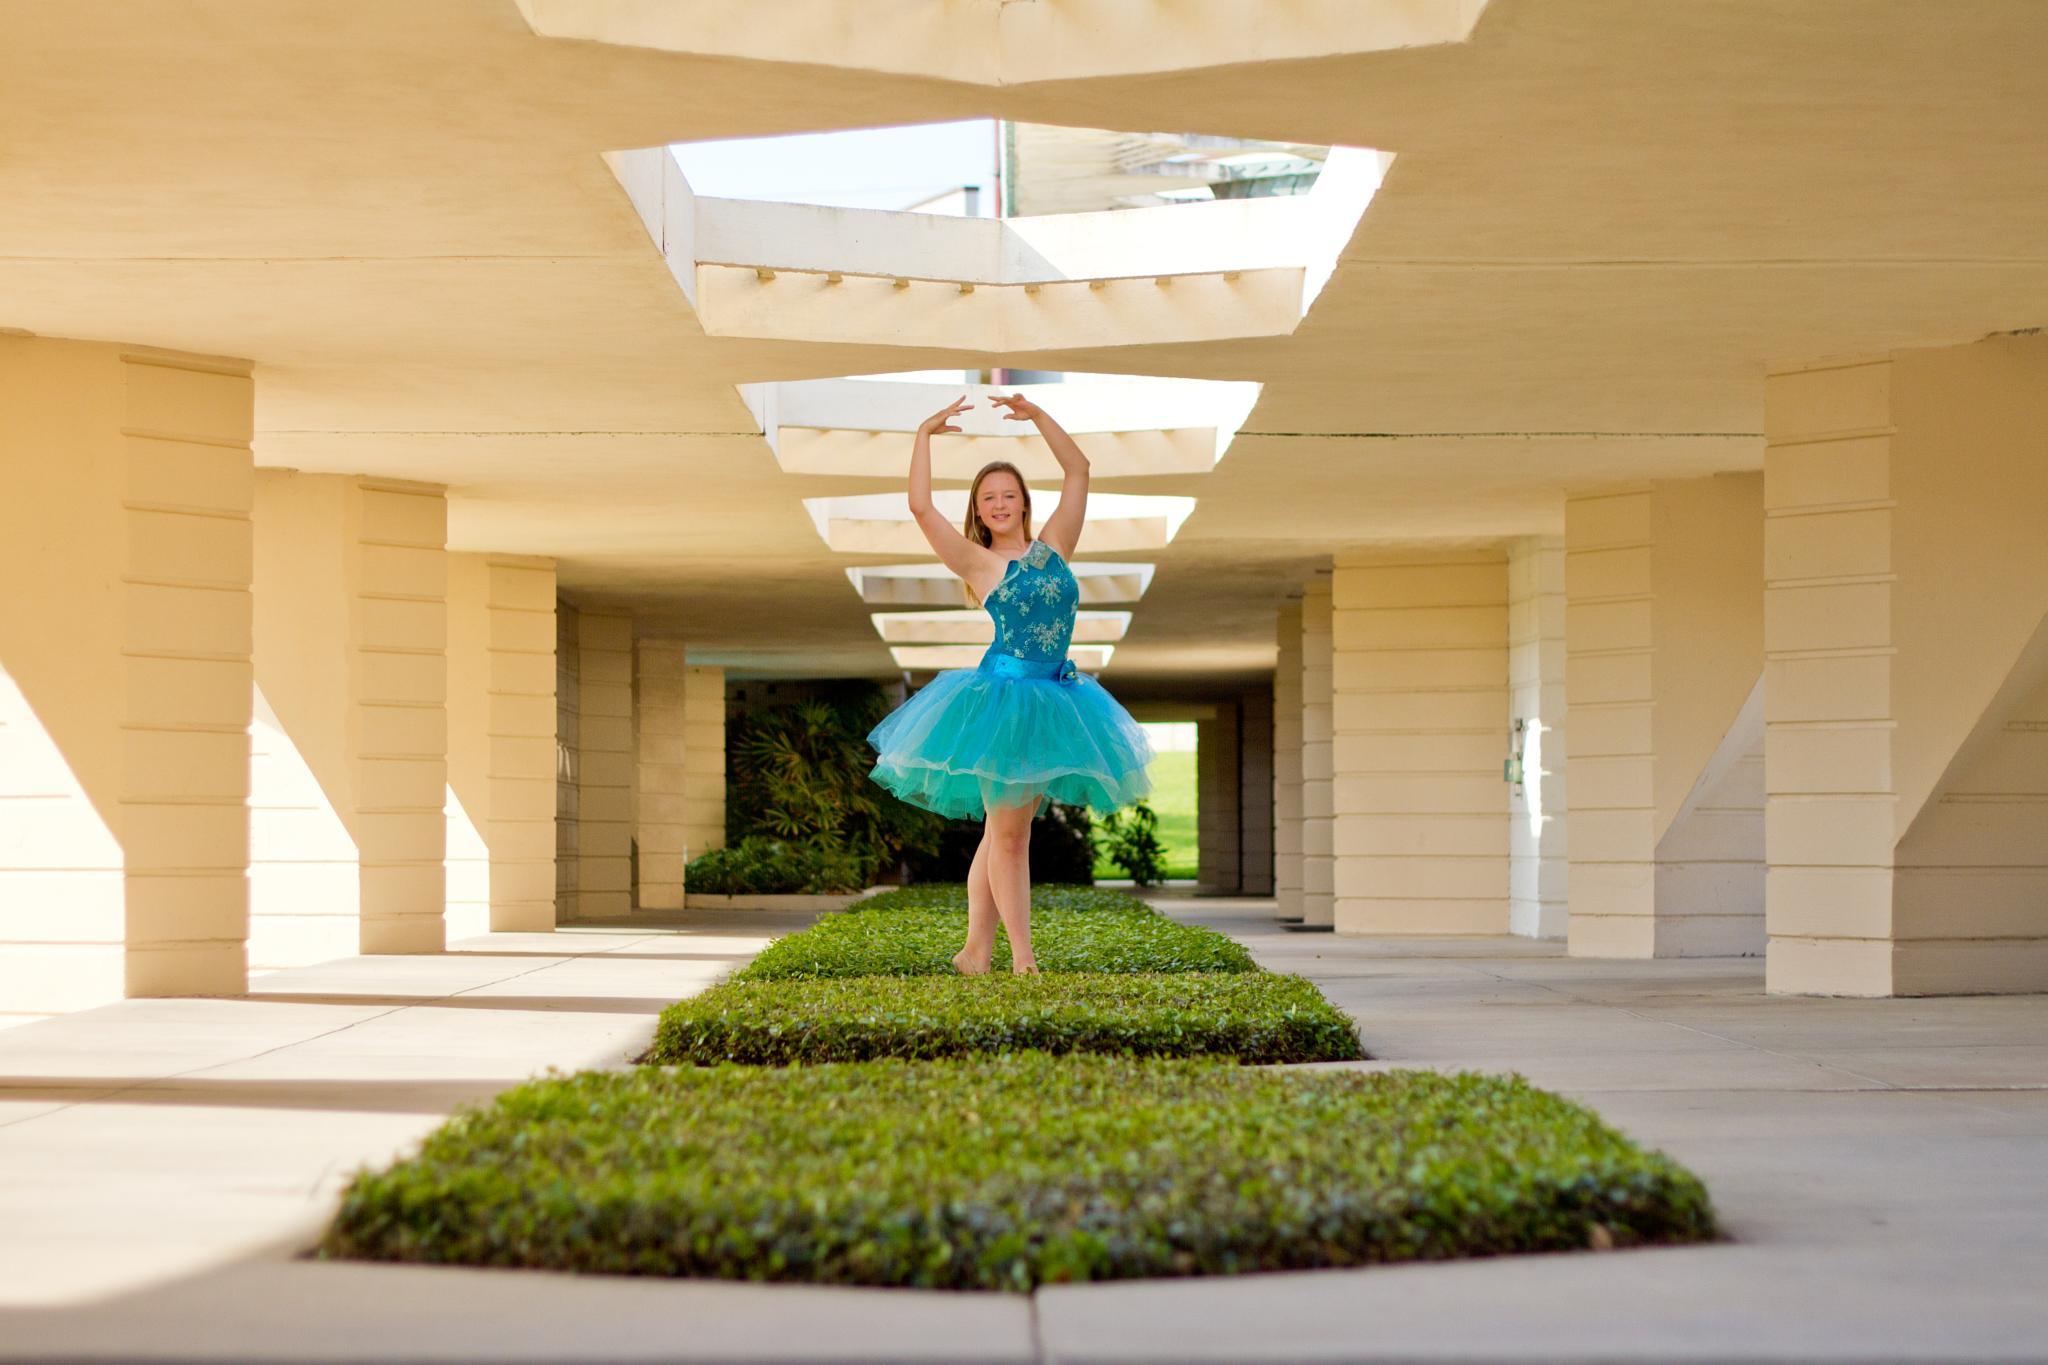 Ballerina by applesnapphoto